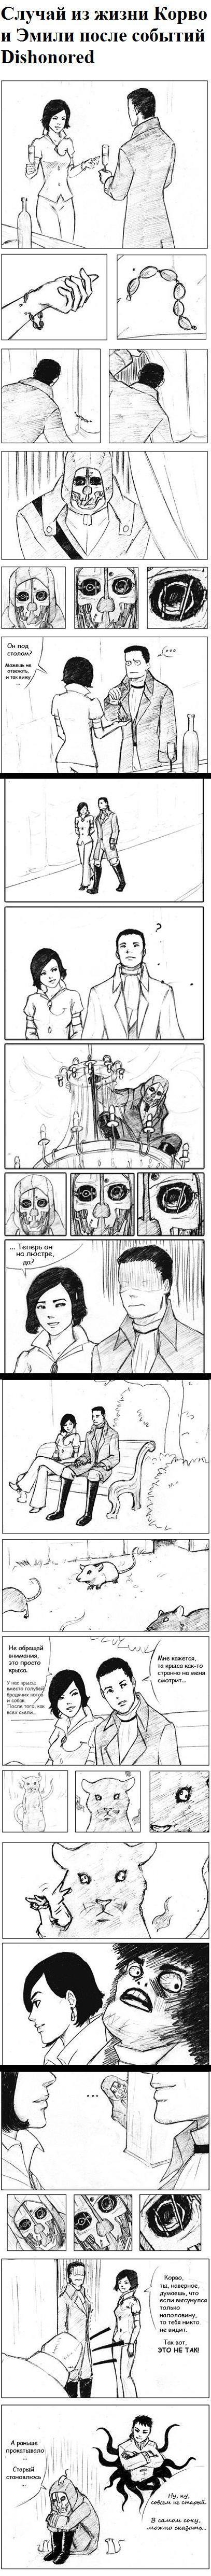 Вот вам крутой комикс по Dishonored - Изображение 1